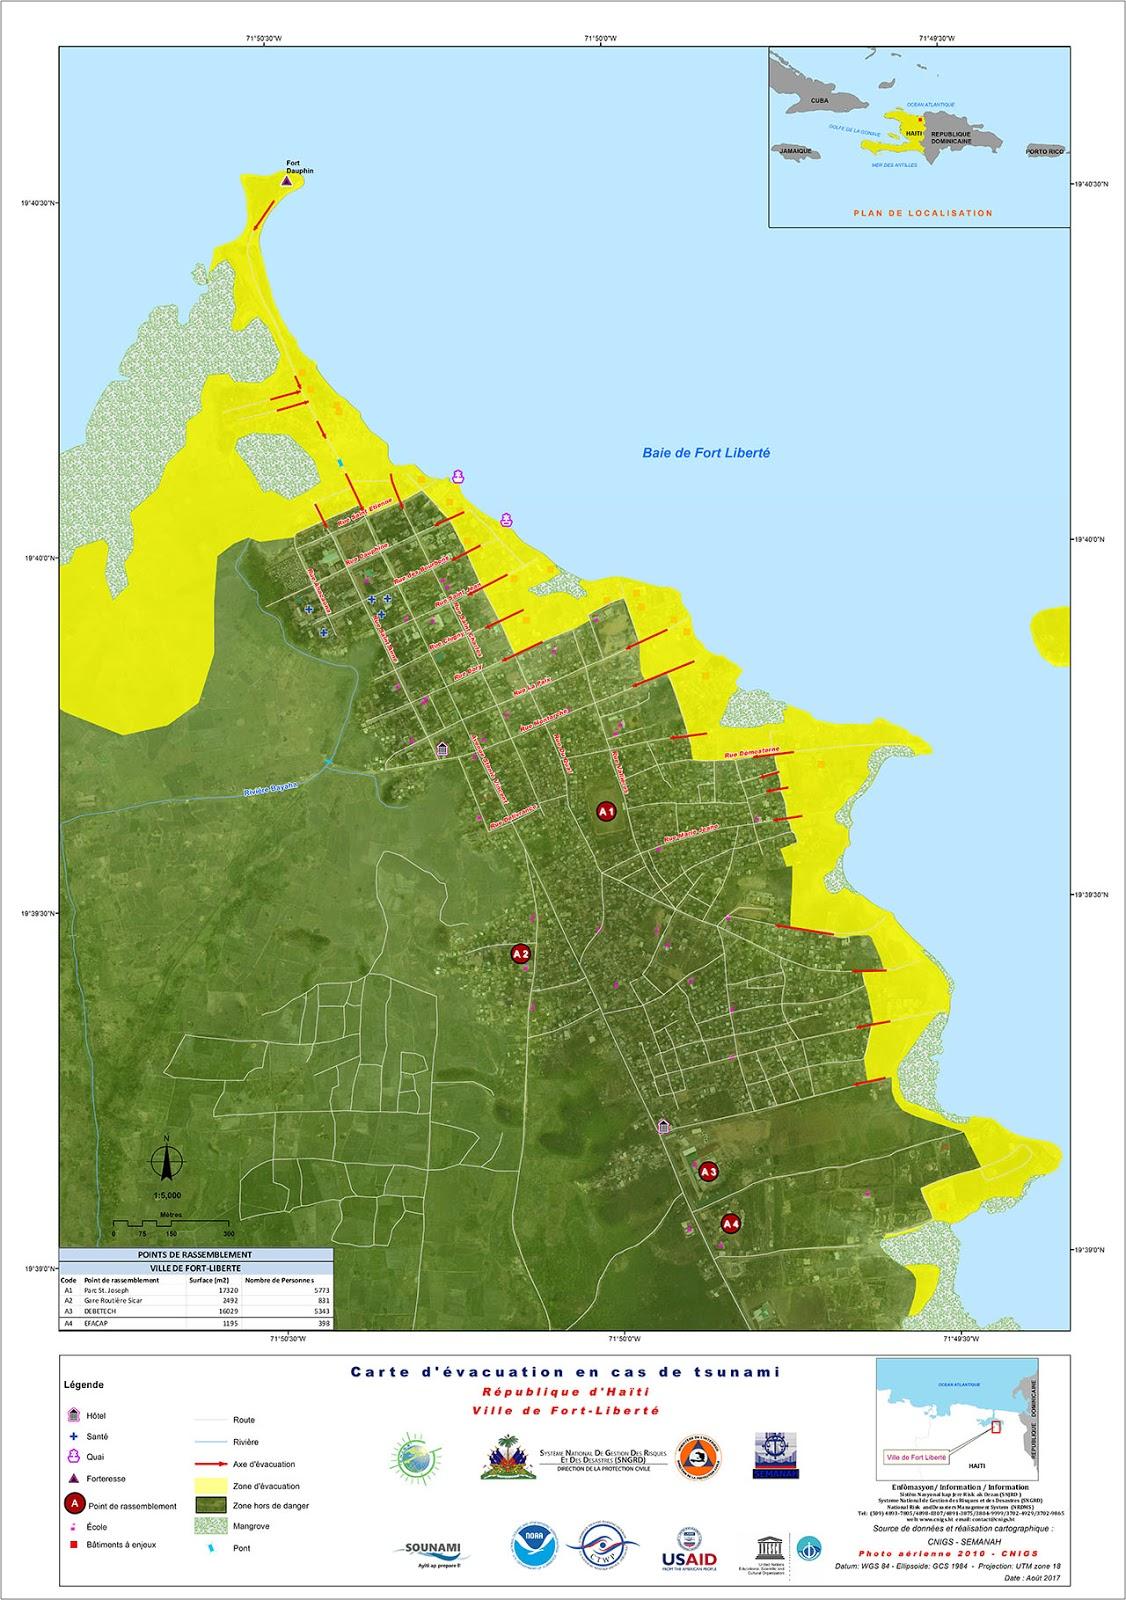 Hati La Commune De Fort Libert Bientt Reconnue Tsunami Ready